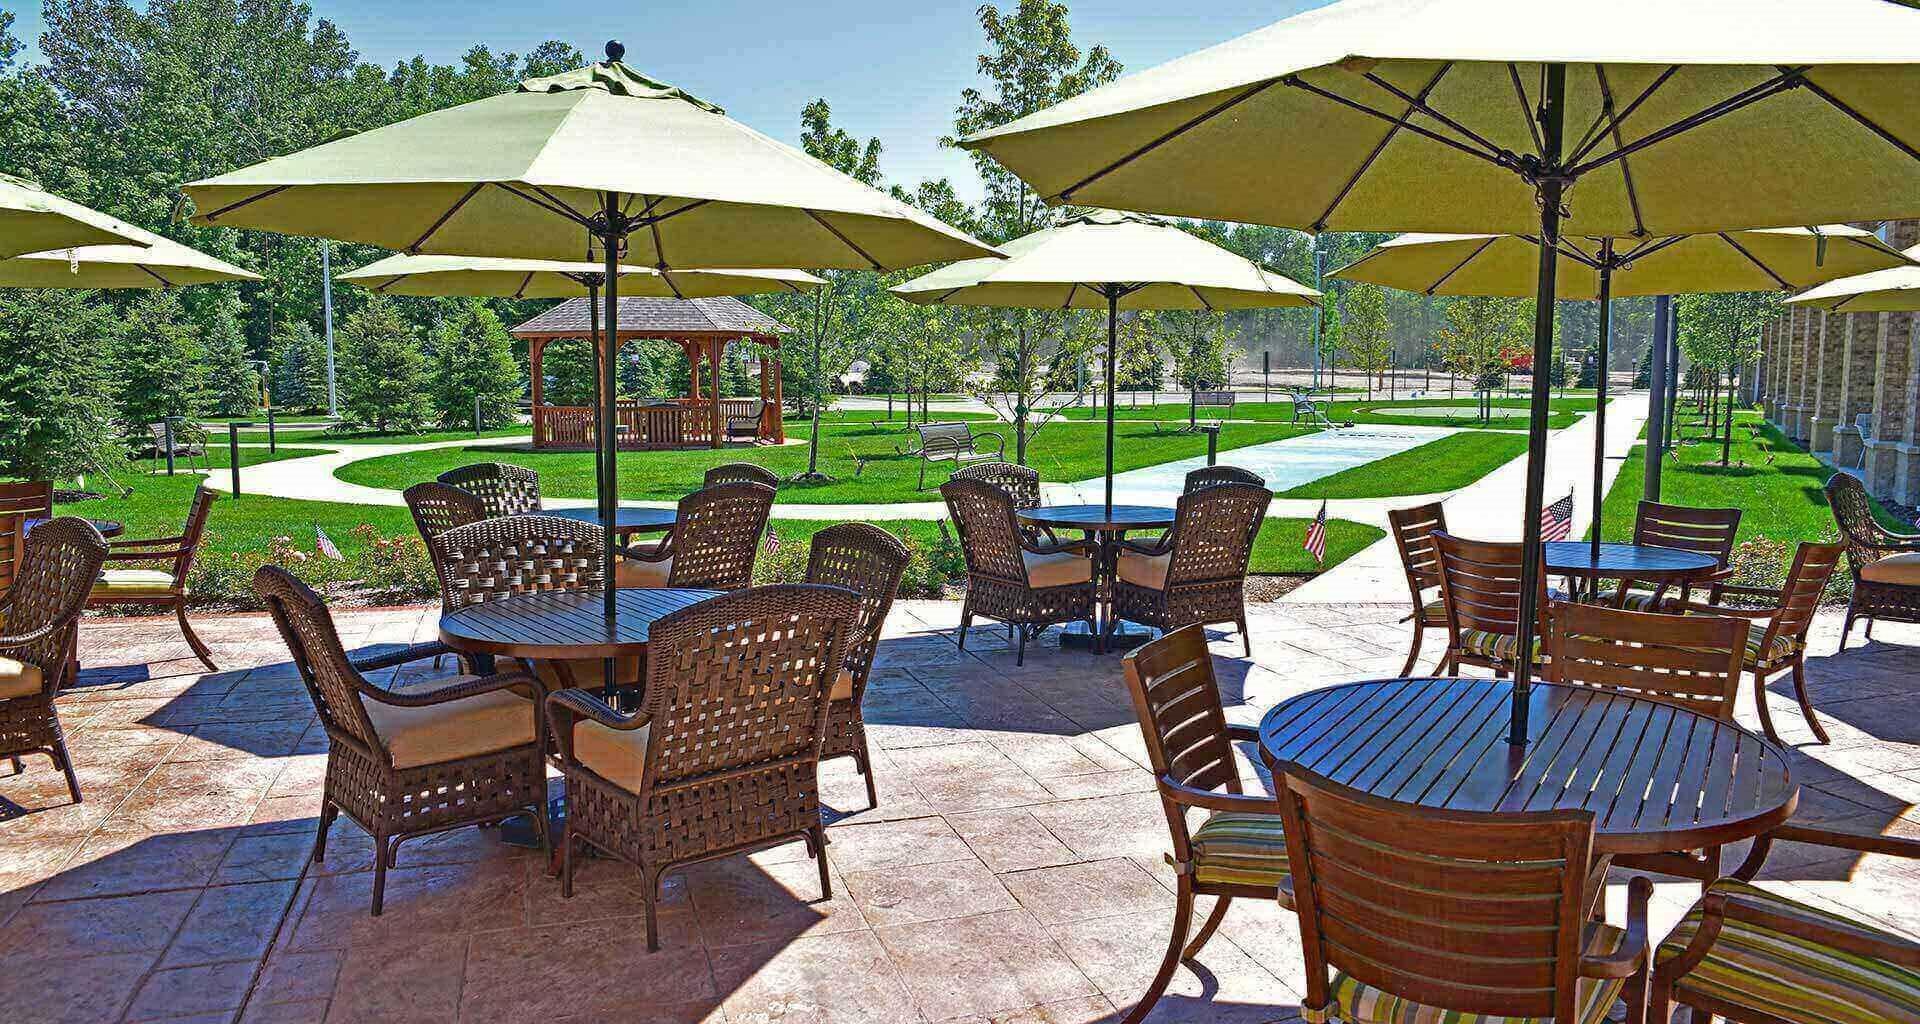 Umbrella Shaded Chairs In Courtyard at Rose Senior Living – Avon, Avon